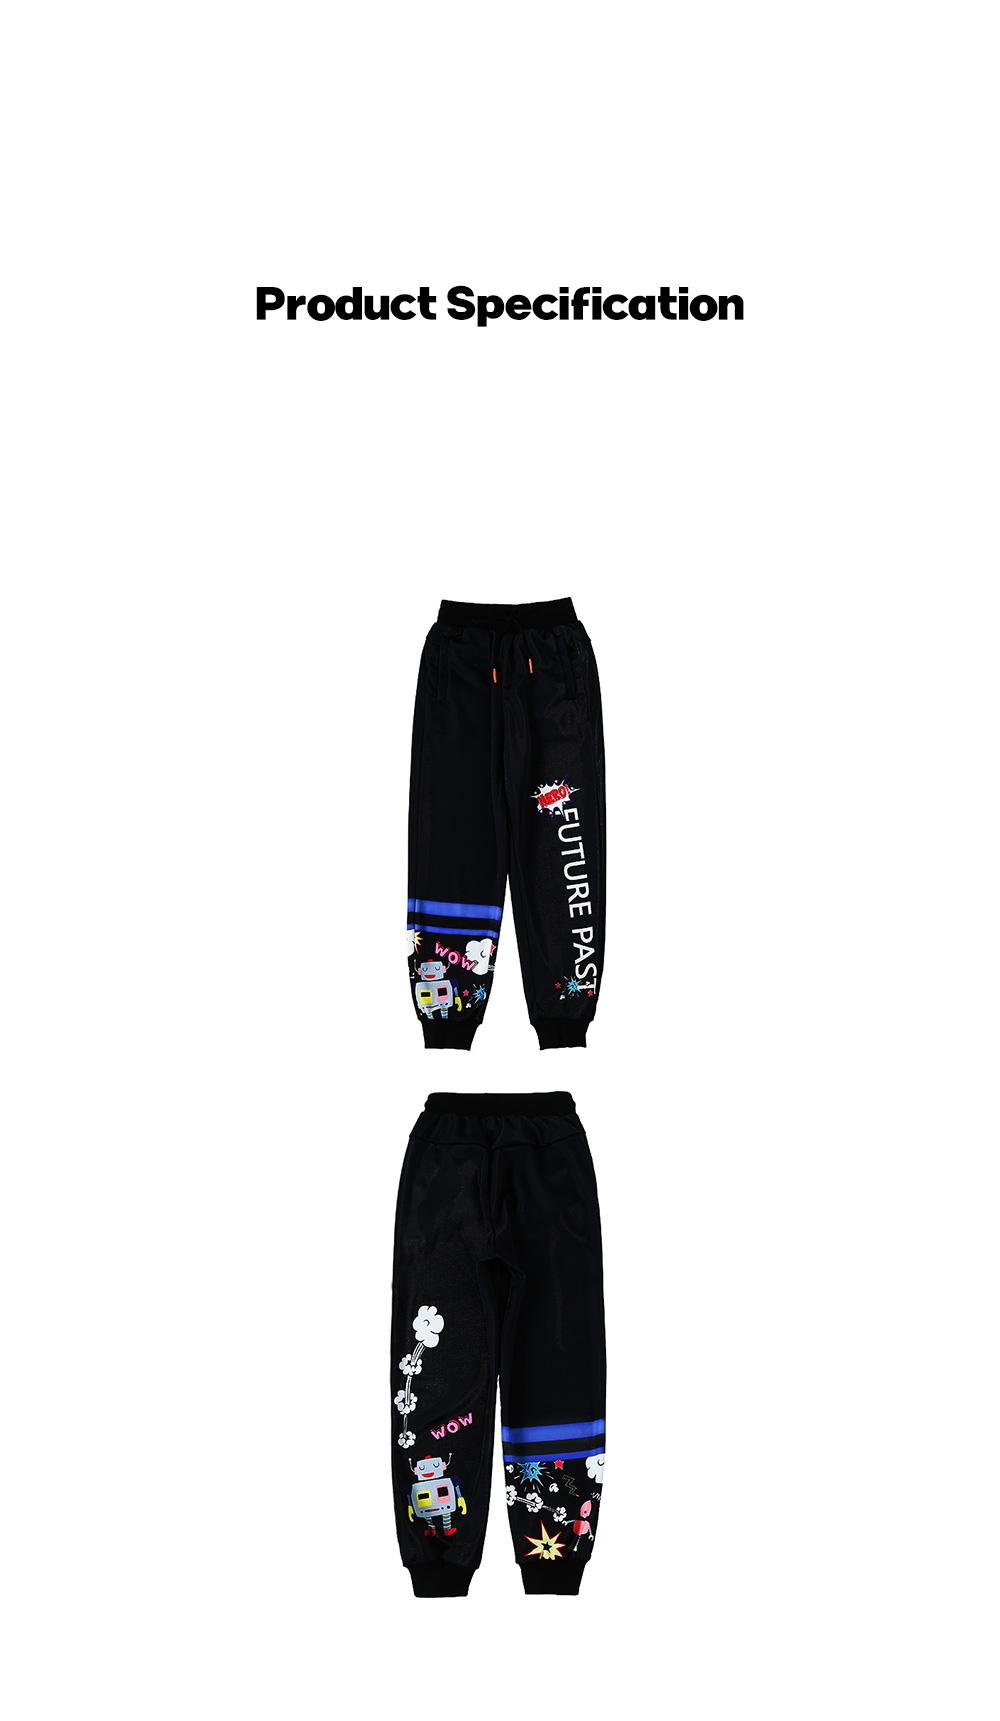 ZVBV 2020 New Style Harem Pants for Women Wear Black Loose Harem Trousers Printed Letter Pattern Sweatpants 12